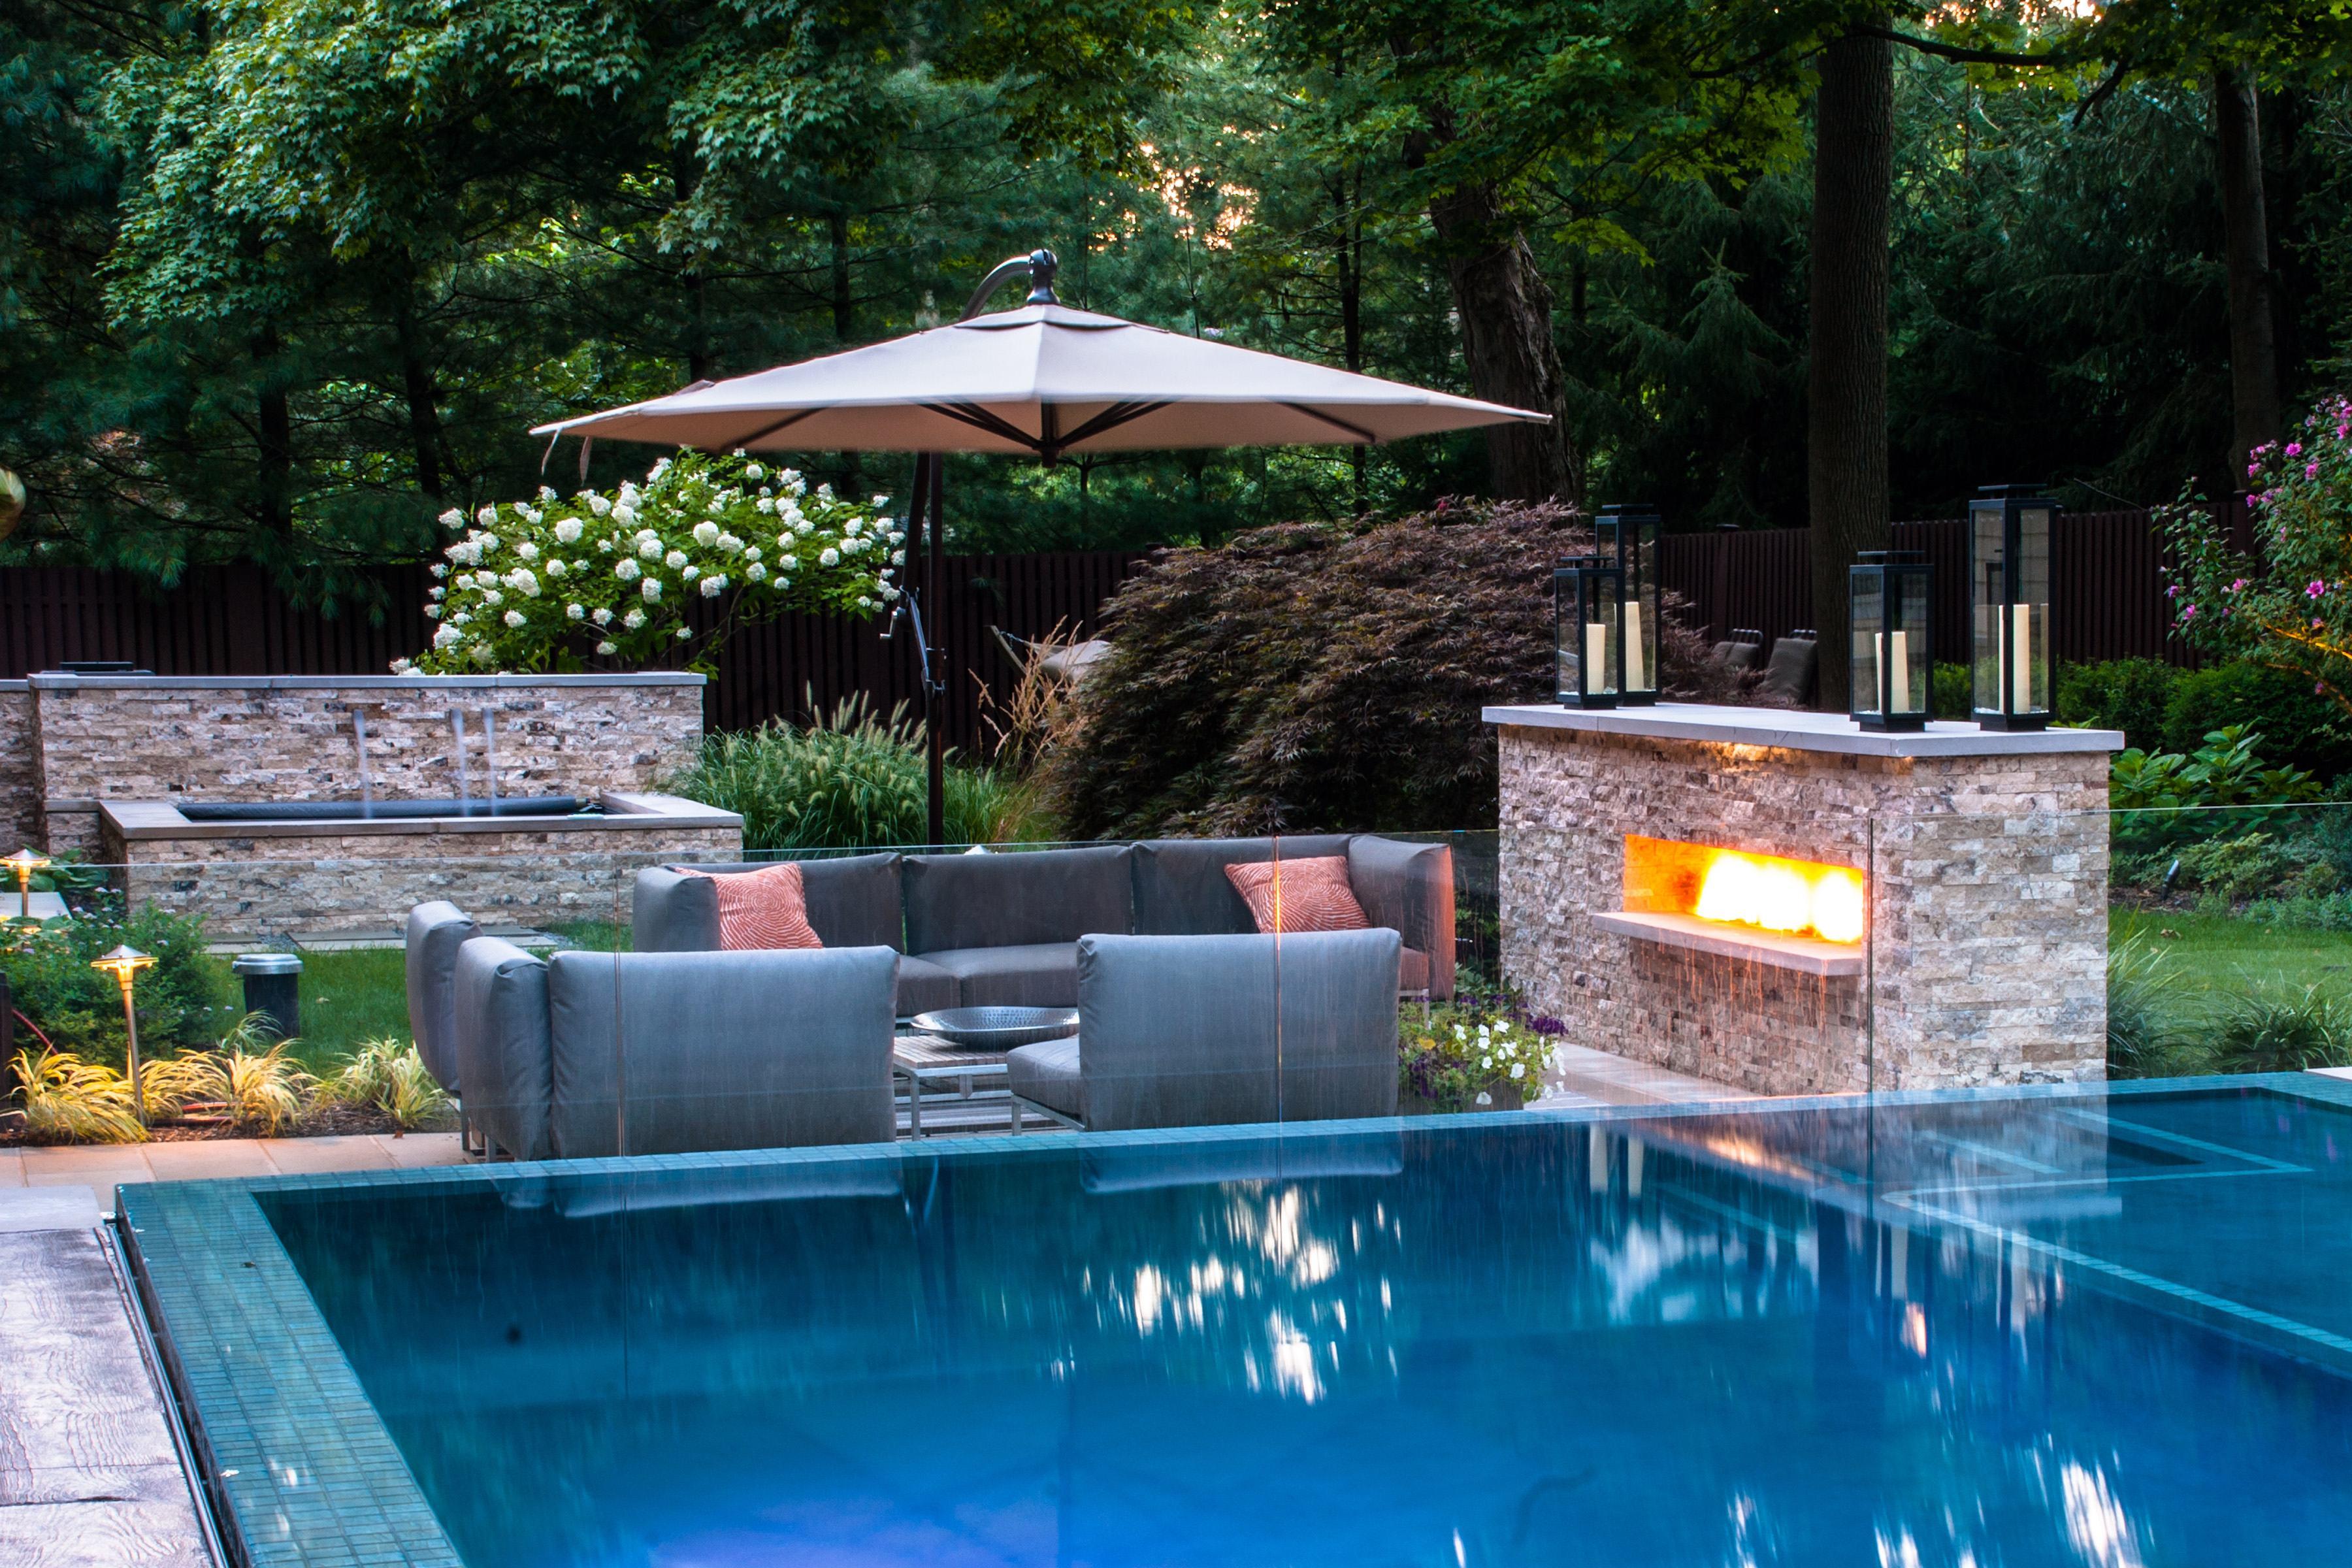 ideas for pool perimeter landscaping pressure dog pressure washing